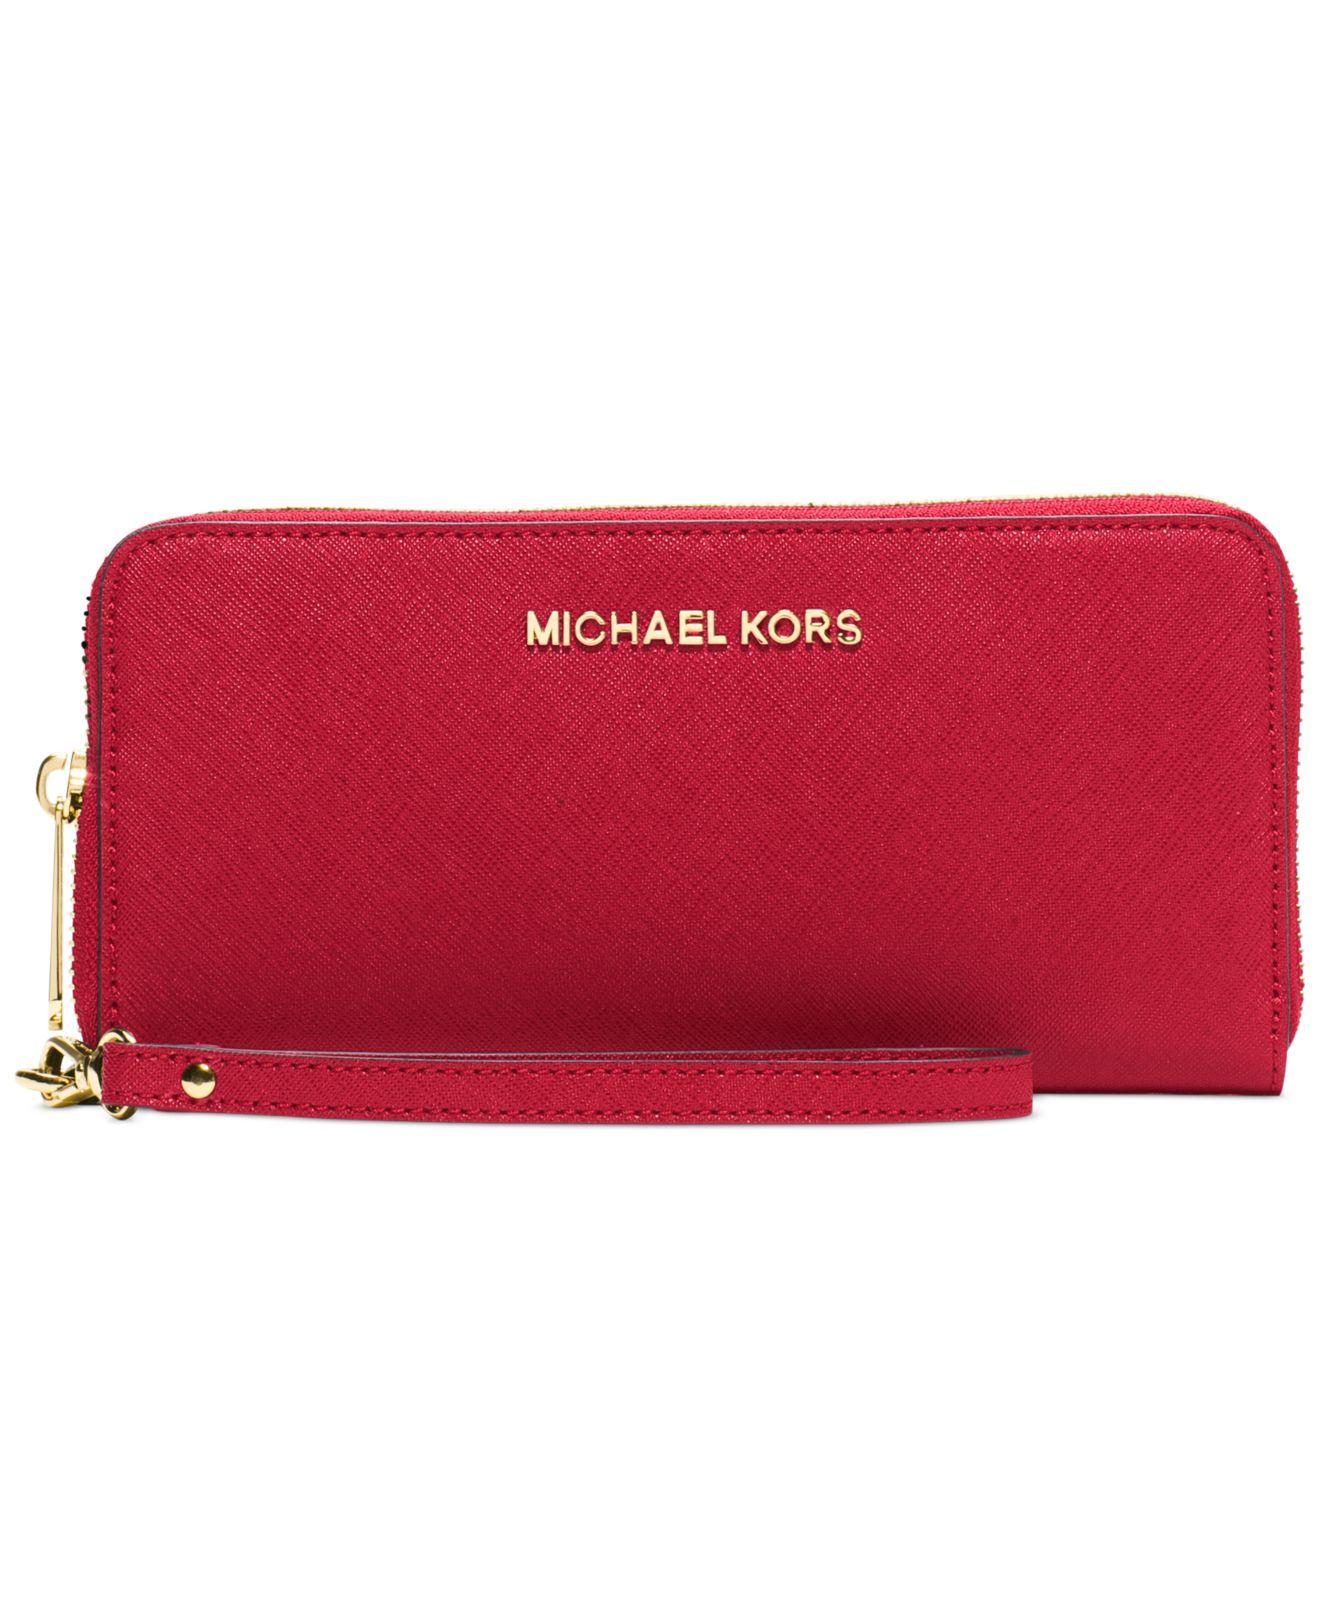 Michael Michael Kors Jet Set Travel Leather Continental Wallet: MICHAEL Michael Kors Jet Set Travel Continental Wallet